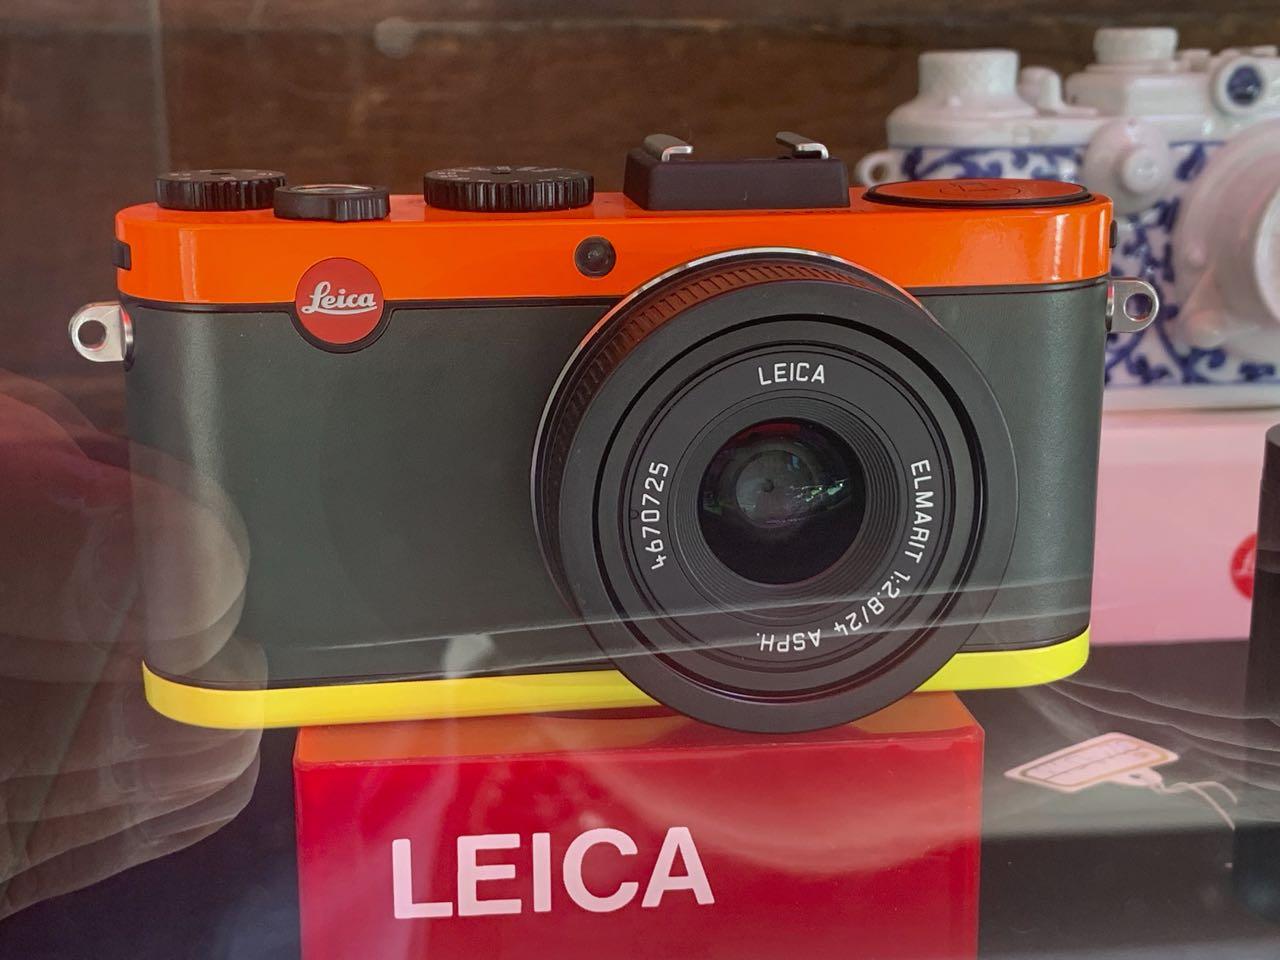 Leica Rumors 2019